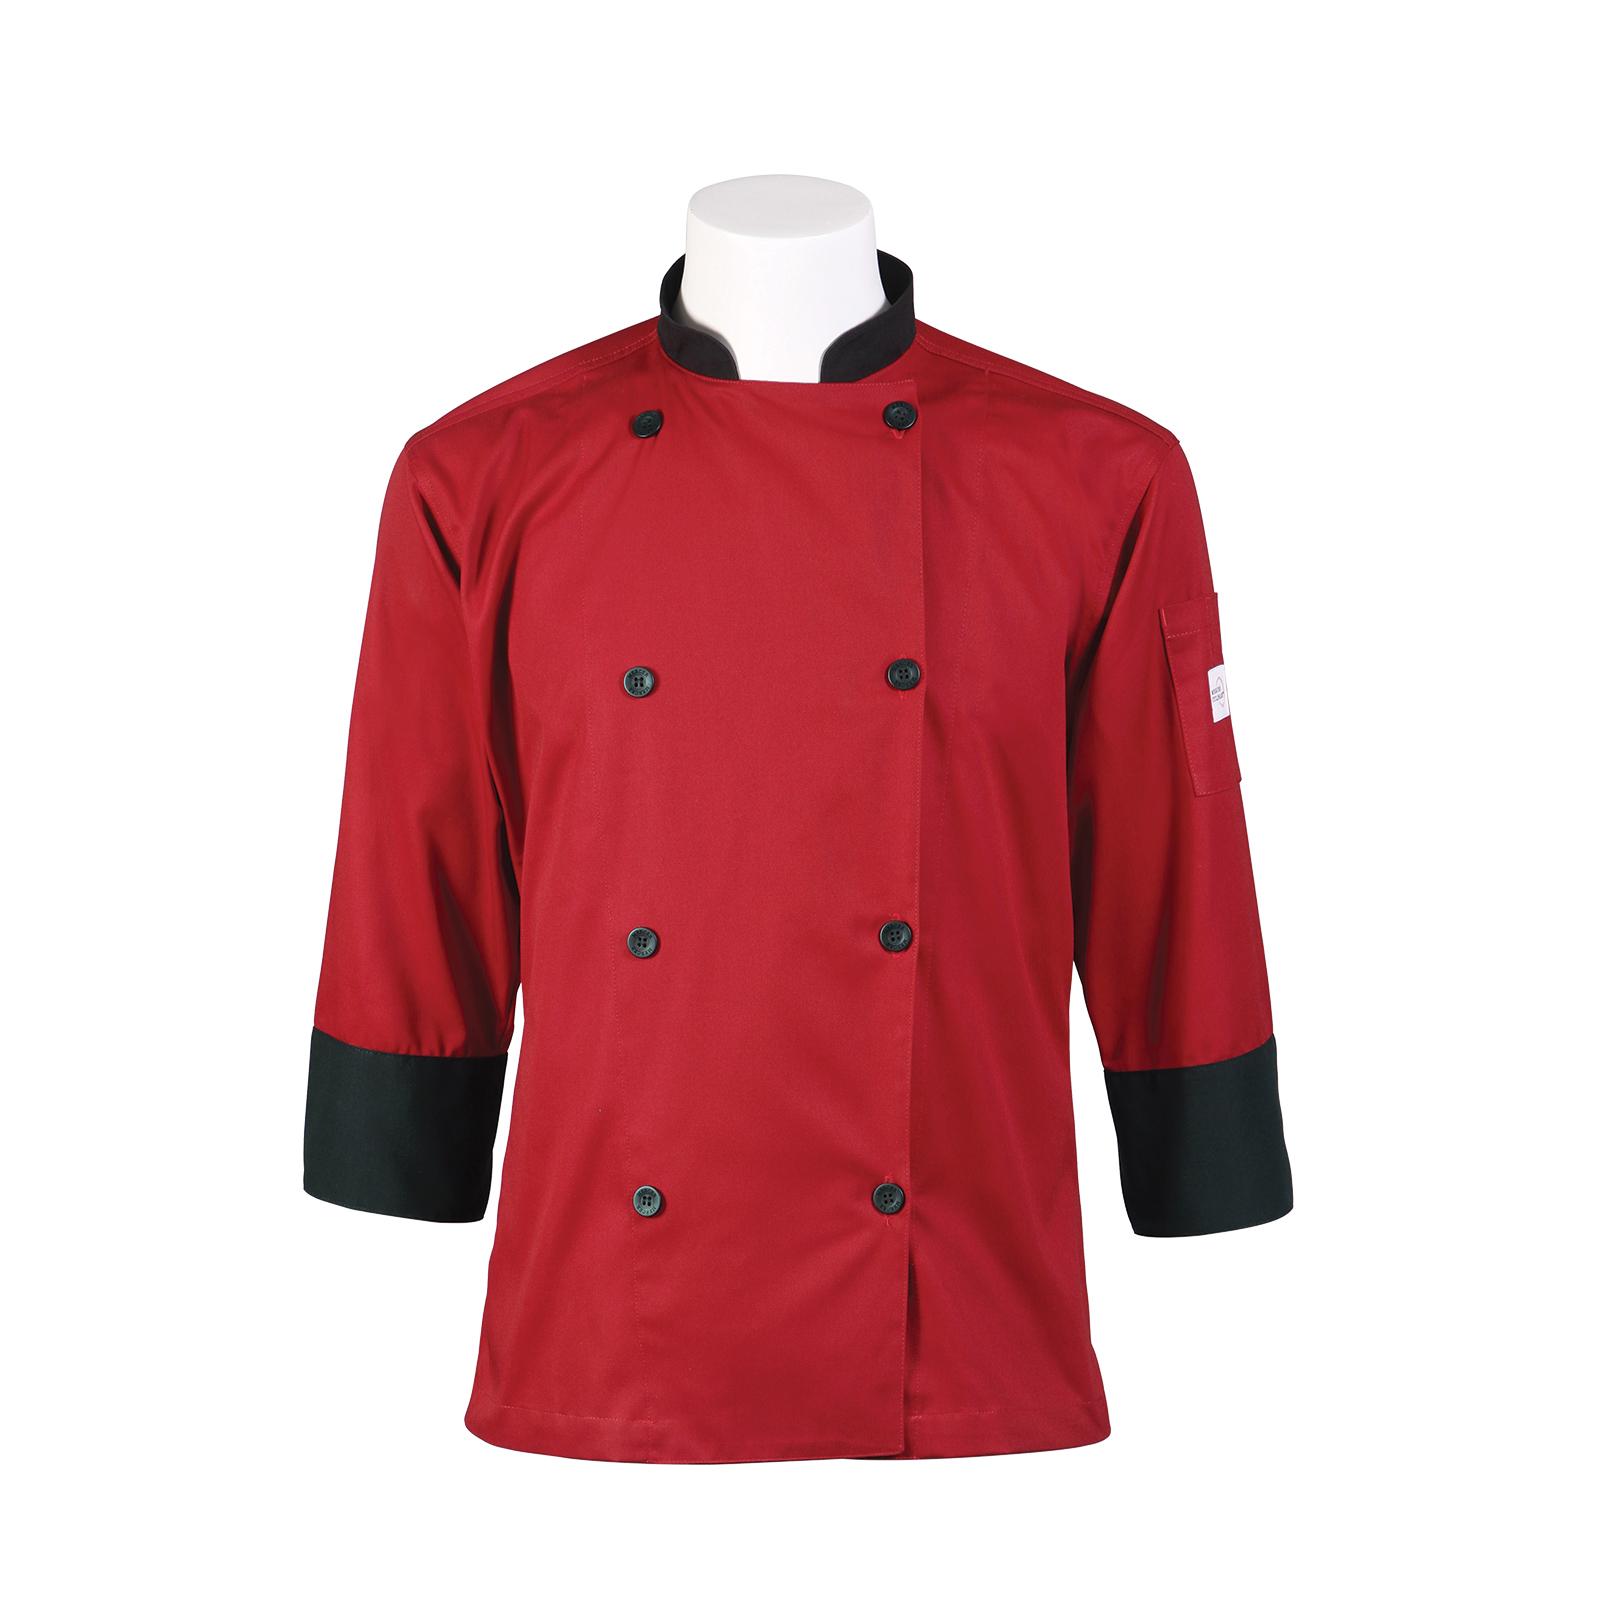 Mercer Culinary M60018RDBM chef's coat